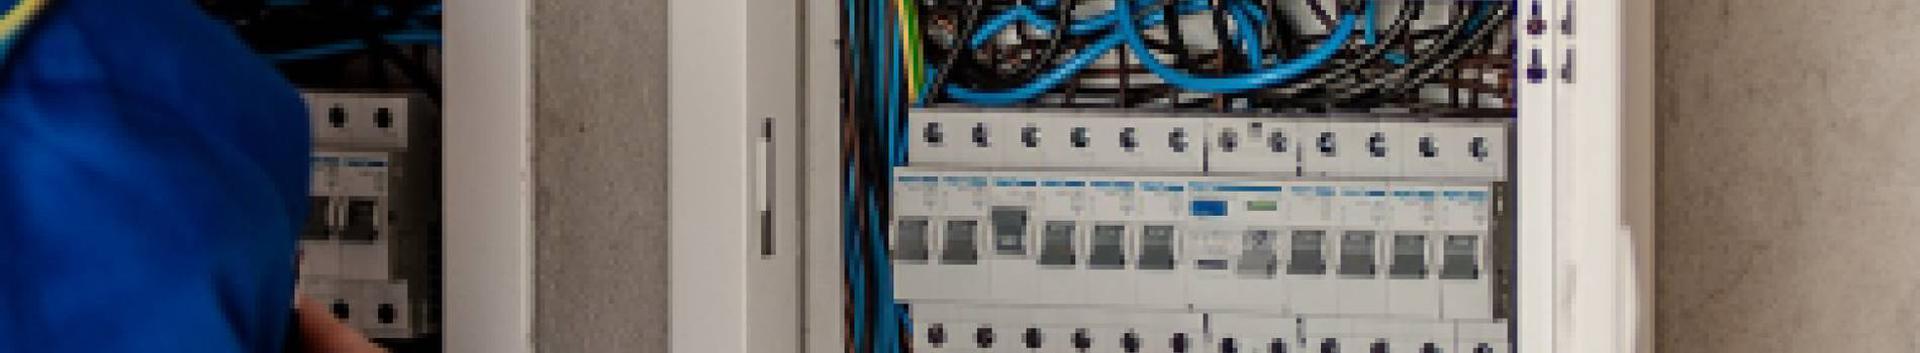 4321_elektriinstallatsioon_64776900_xl.jpg